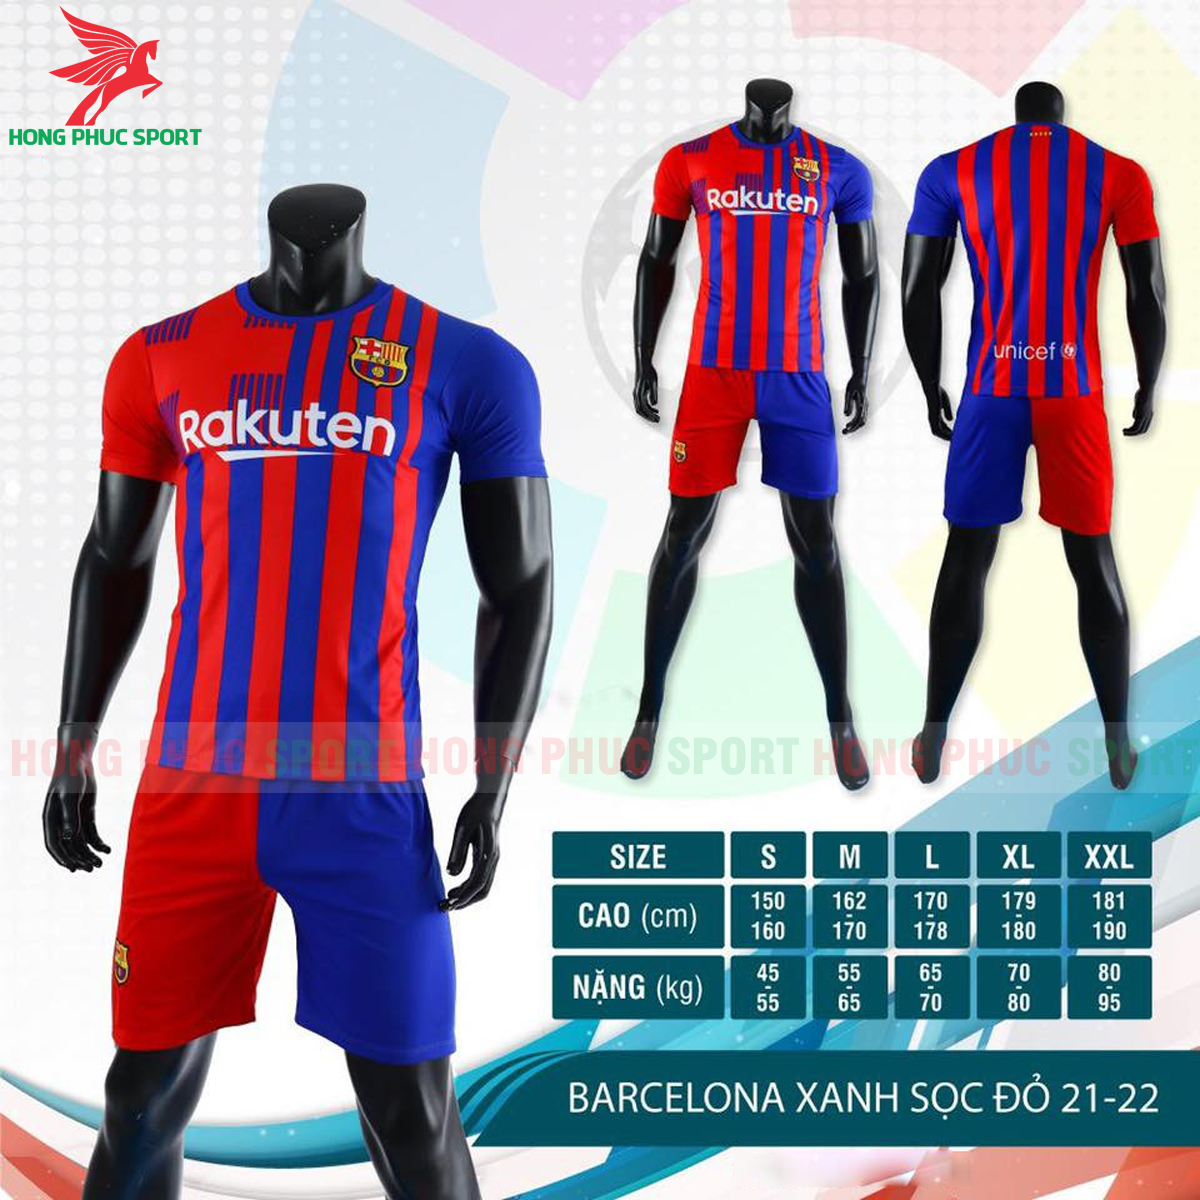 https://cdn.hongphucsport.com/unsafe/s4.shopbay.vn/files/285/ao-bong-da-san-nha-barcelona-2021-2022-6074ffc9e32e9.png